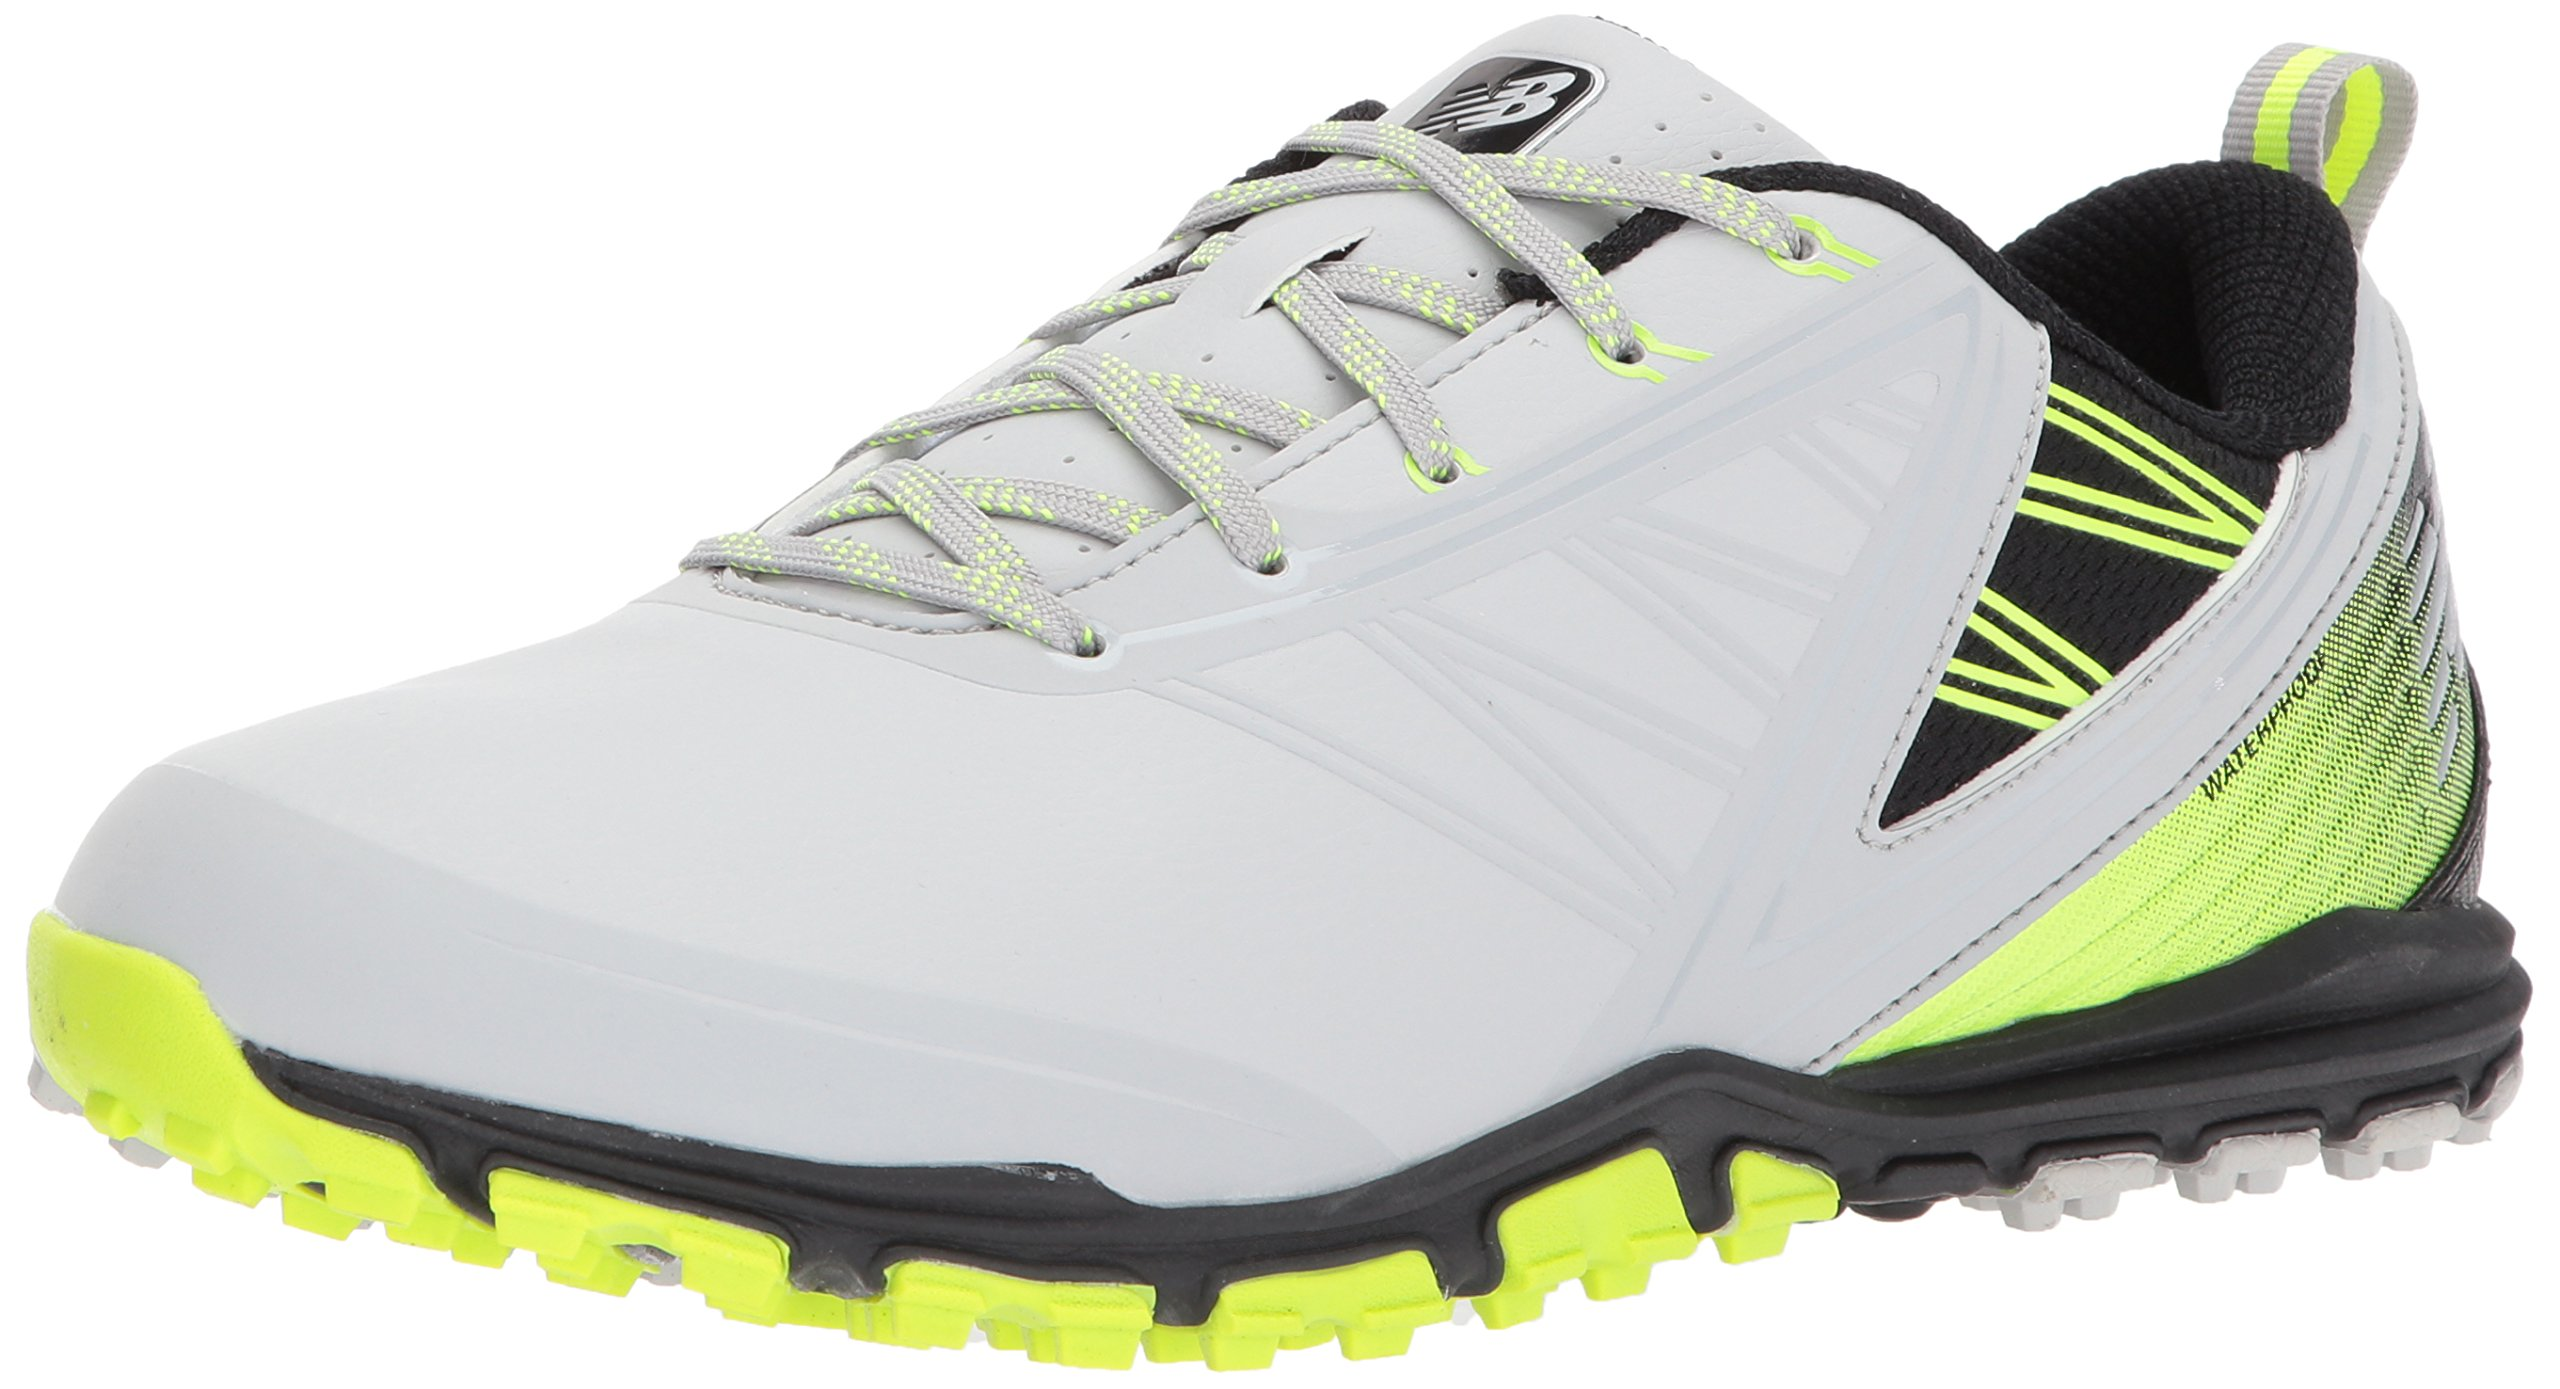 65ef8976 New Balance Men's Minimus SL Golf Shoe, Grey/Green, 10 D D US